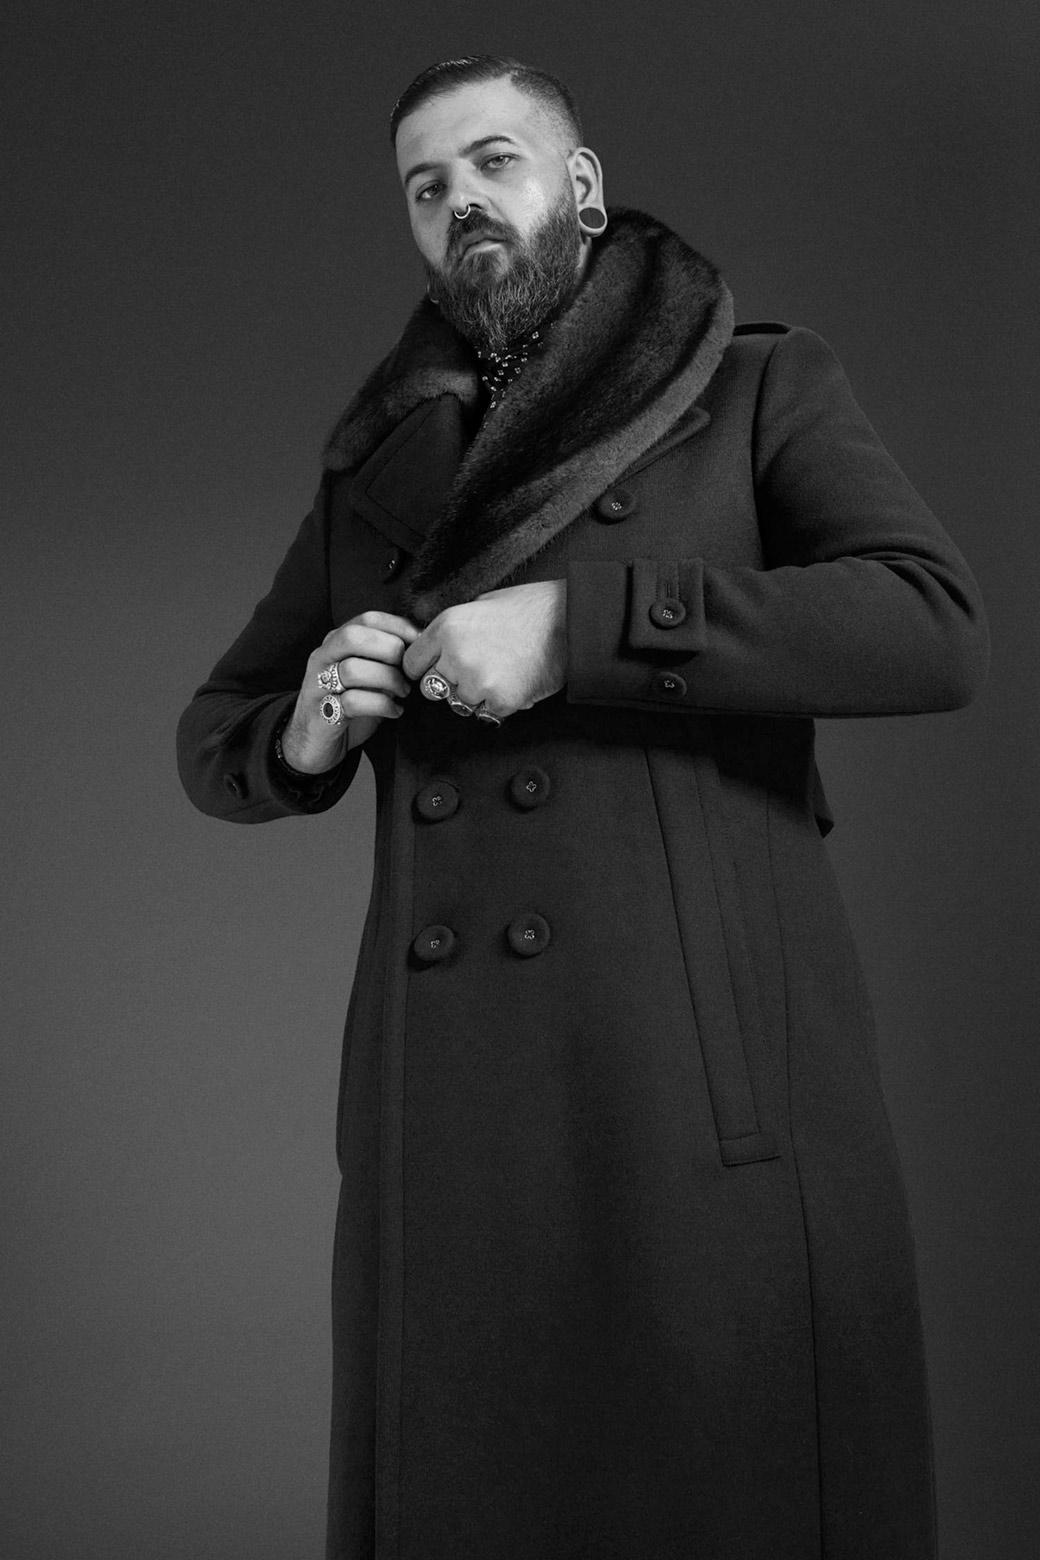 Foto Fabio Leidi. Style Edoardo Marchiori